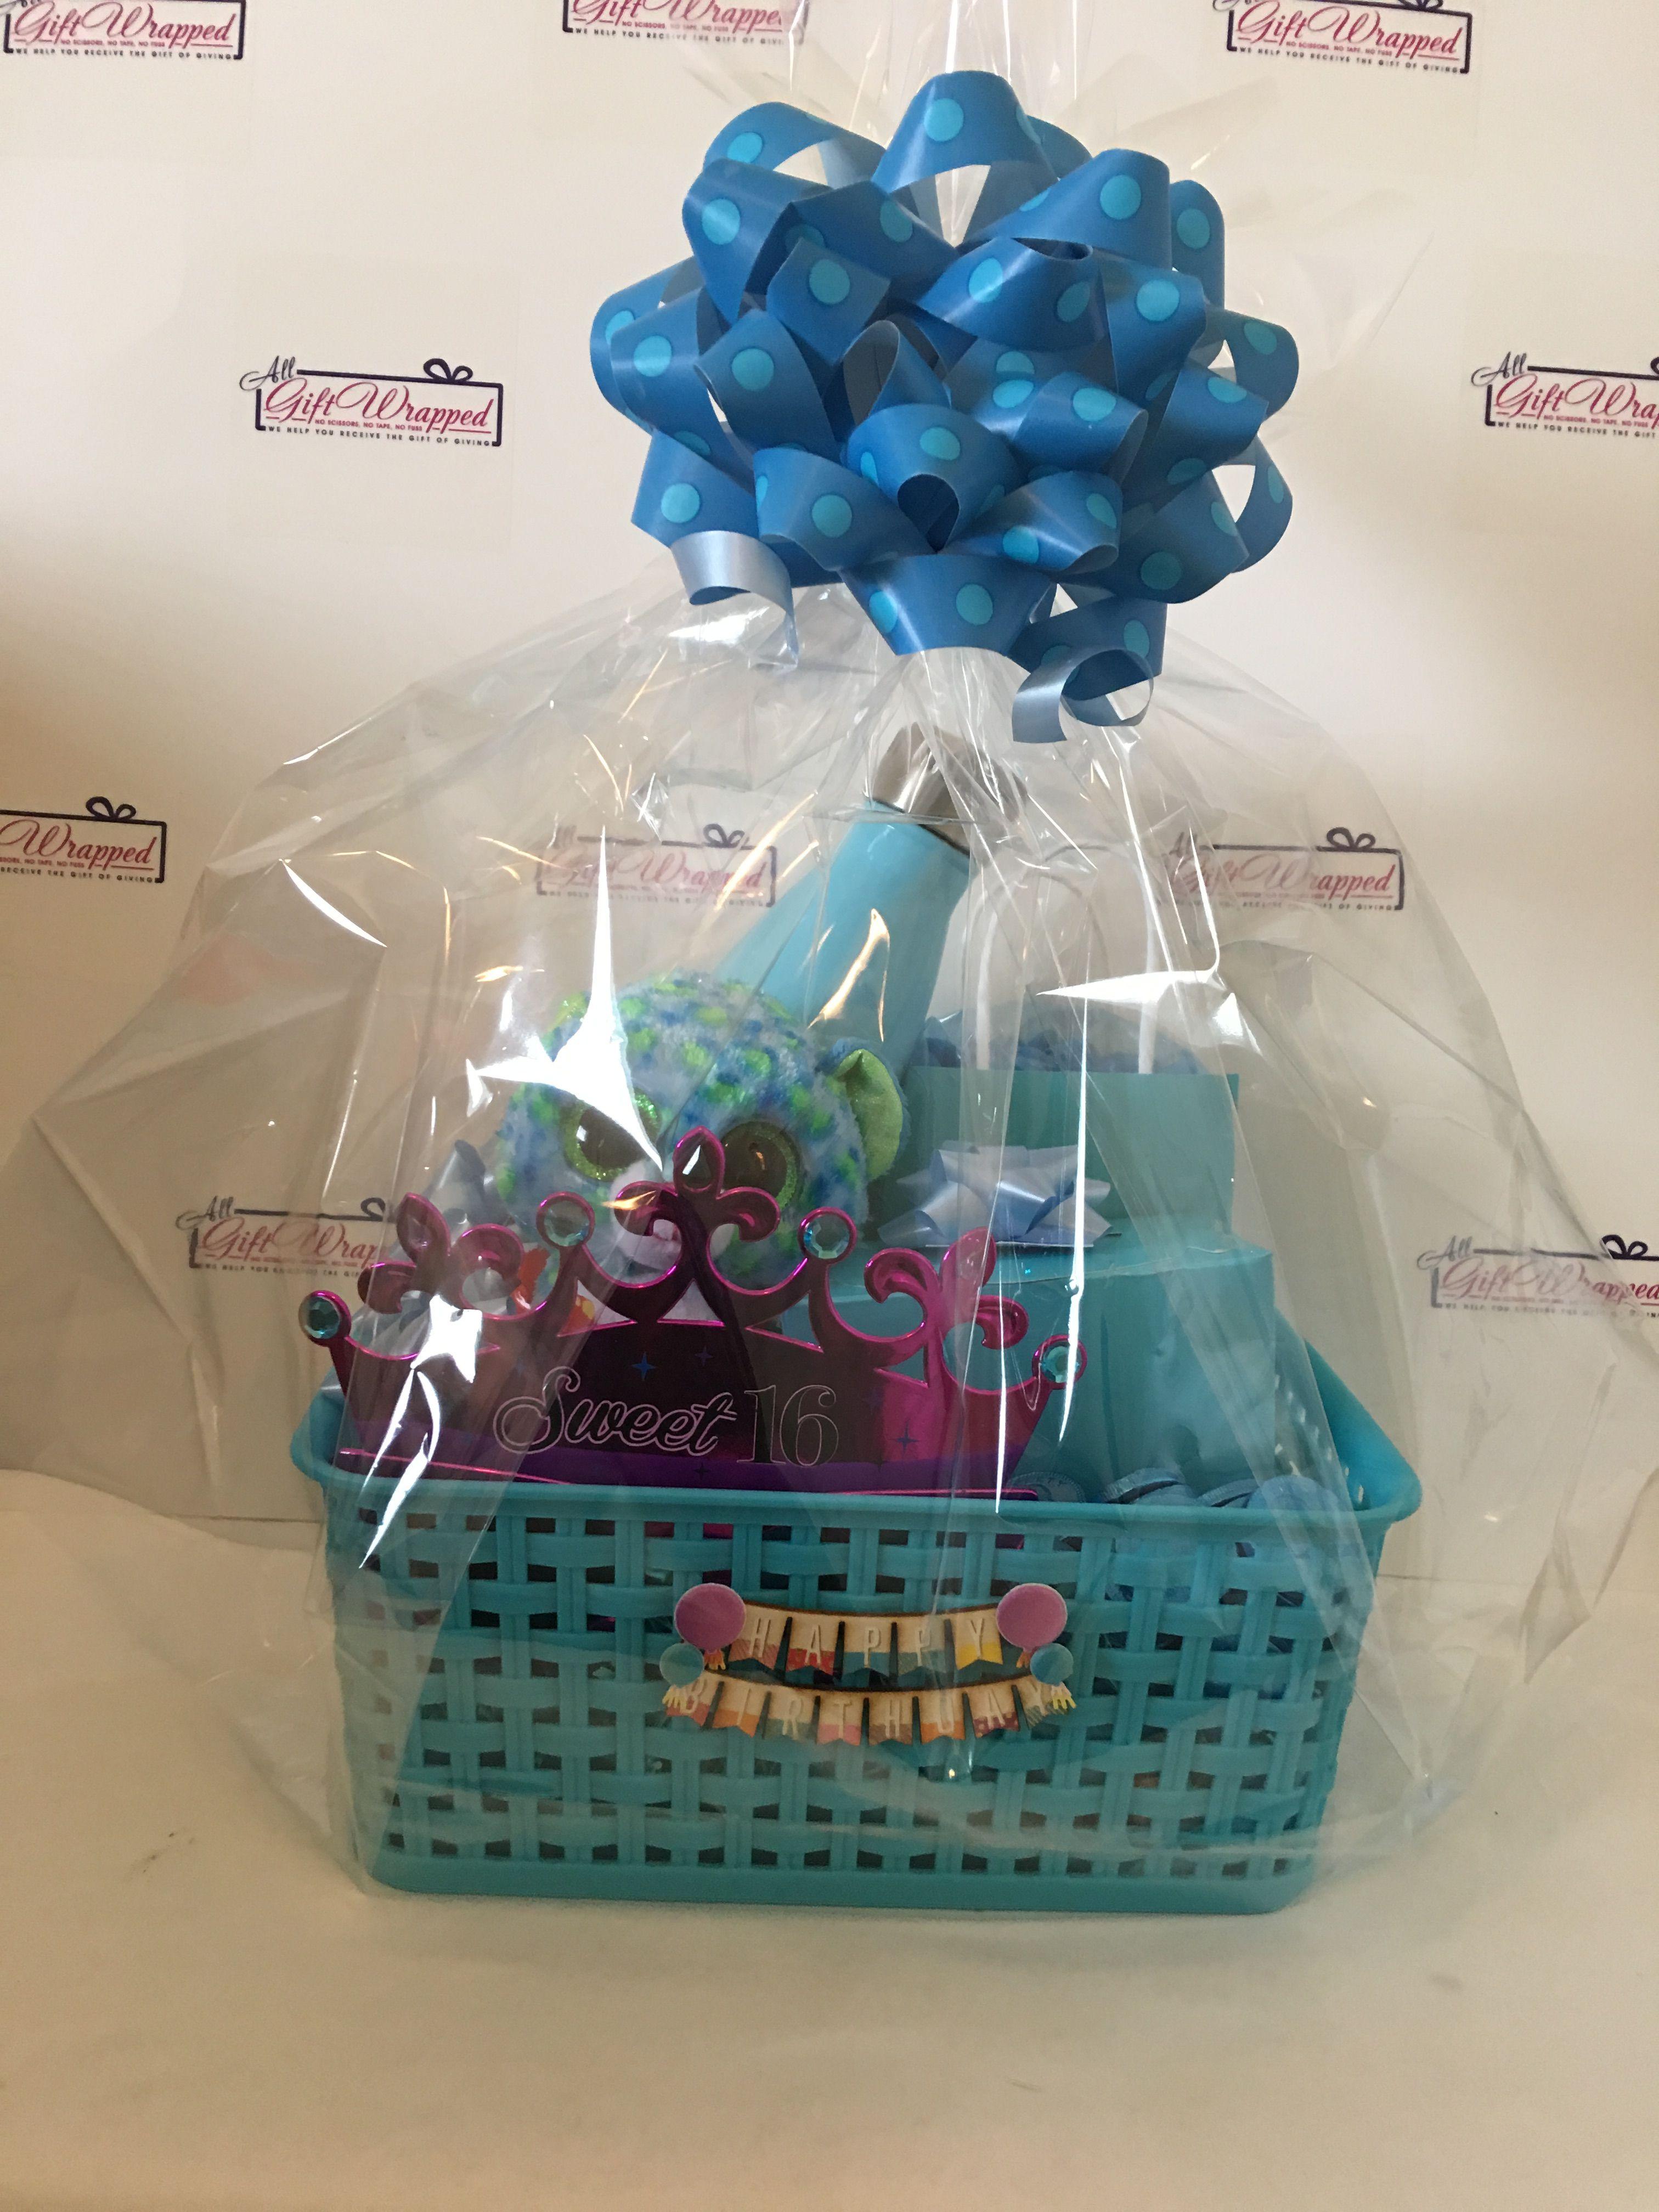 sweet 16 gift ideas canada